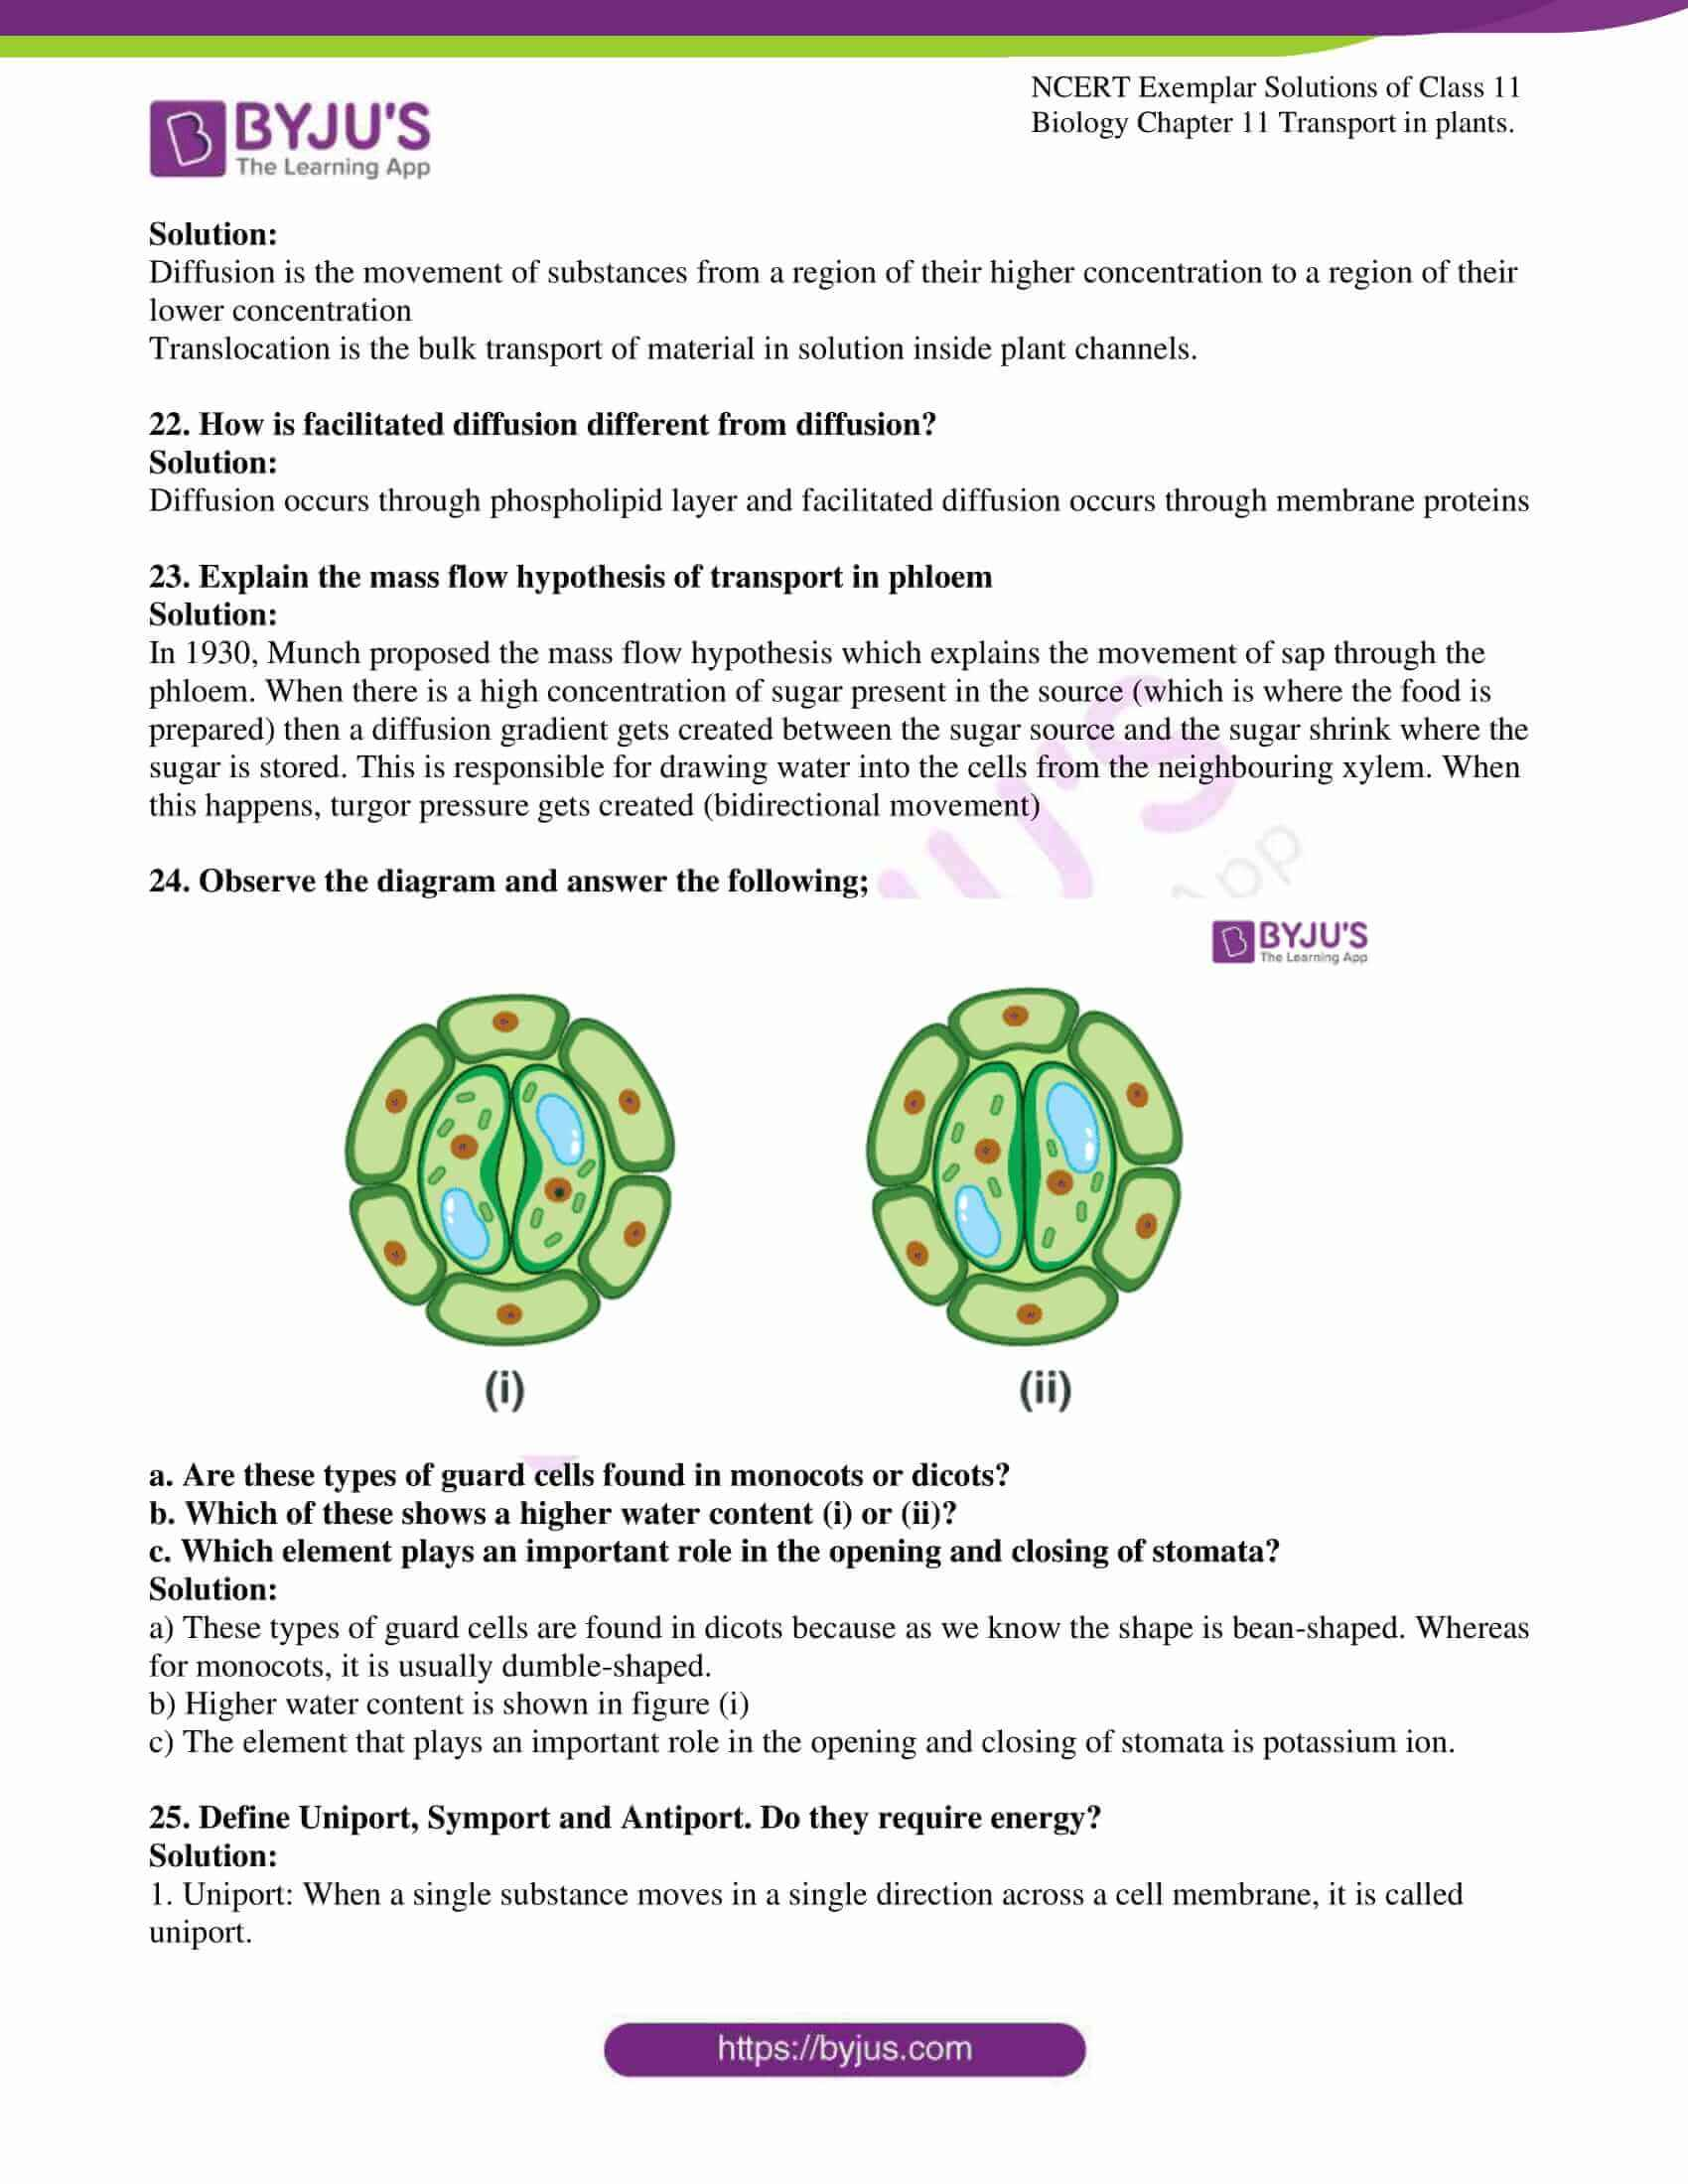 ncert exemplar solutions for class 11 bio chapter 11 12